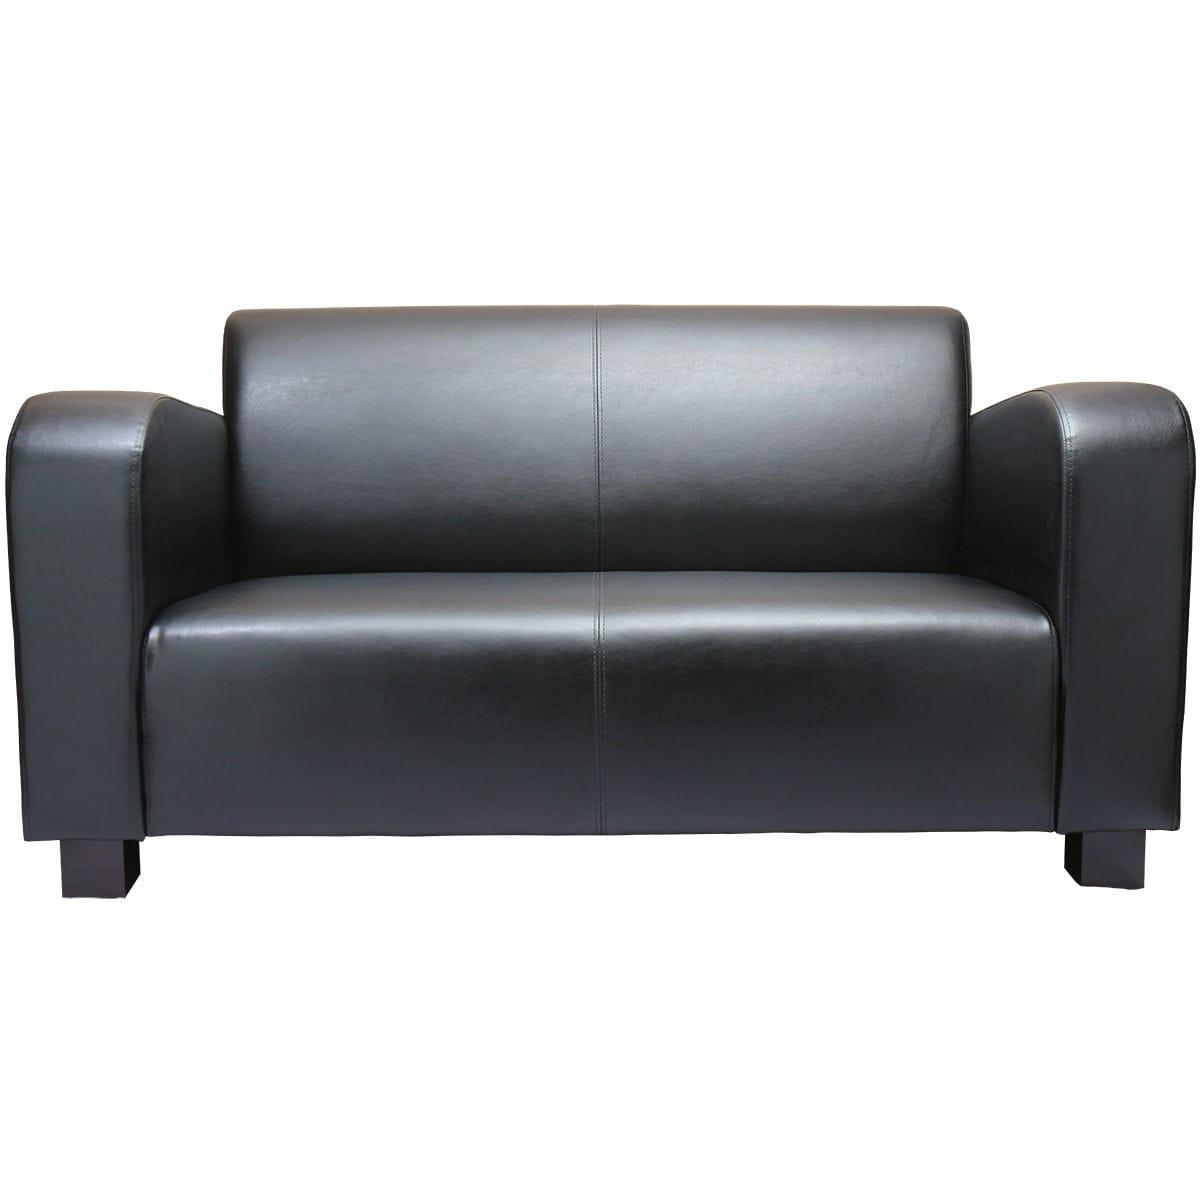 Modernes Sofa Leder Fur Hotels Fur Buro Wersal 2s Sedja